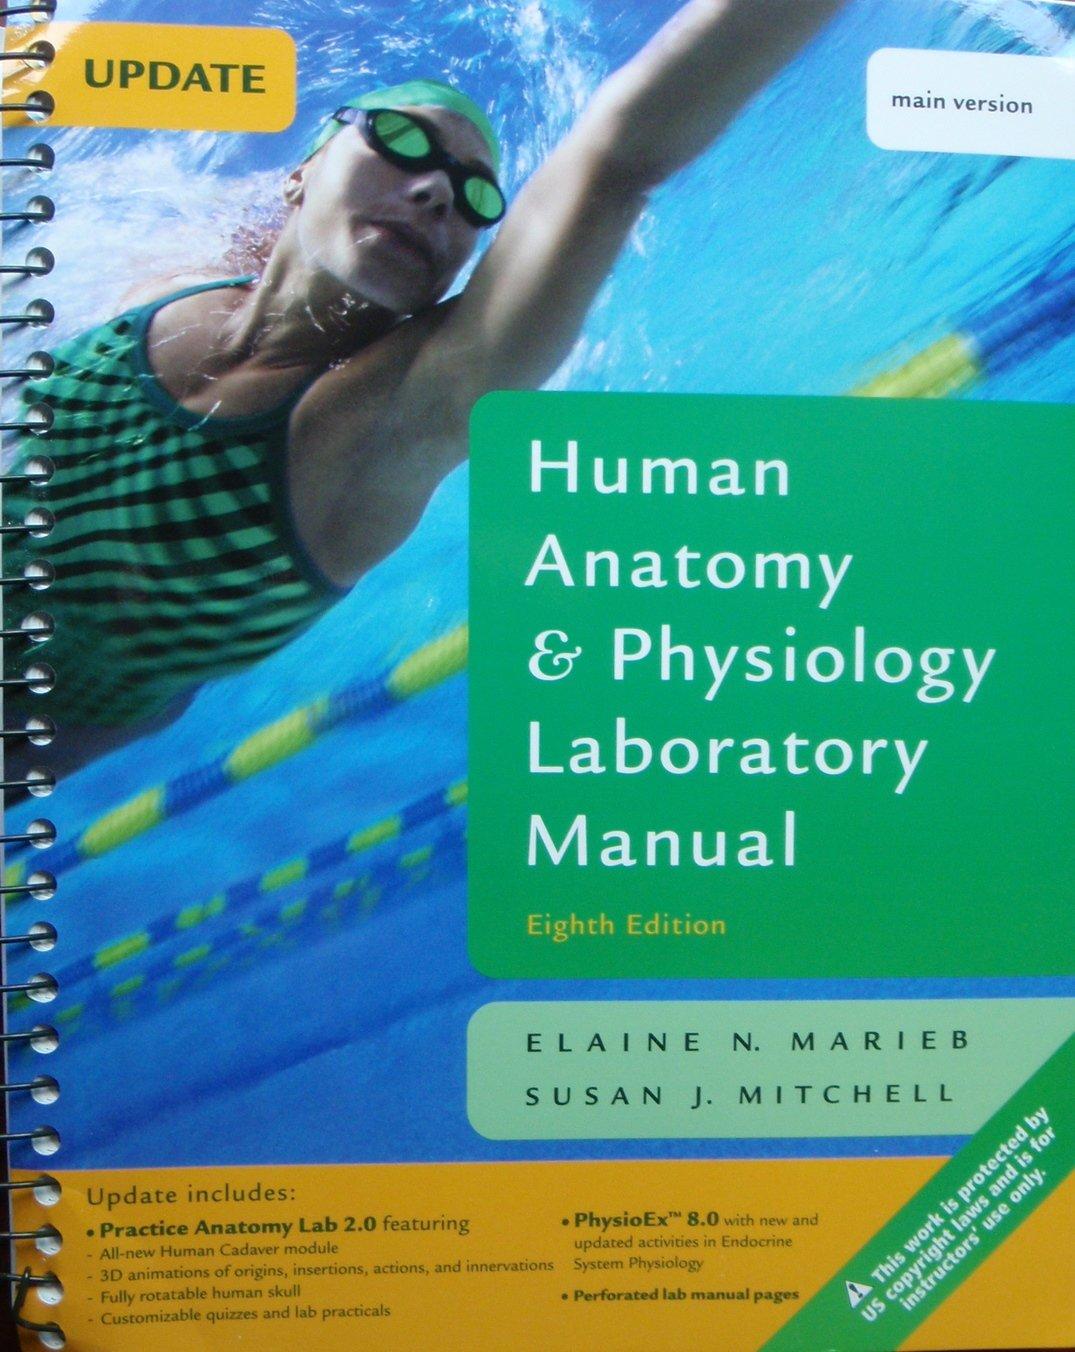 Human Anatomy & Physiology Laboratory Manual (Main Version Update): Elaine  N. Marieb & Susan J. Mitchell: 9780321540331: Amazon.com: Books